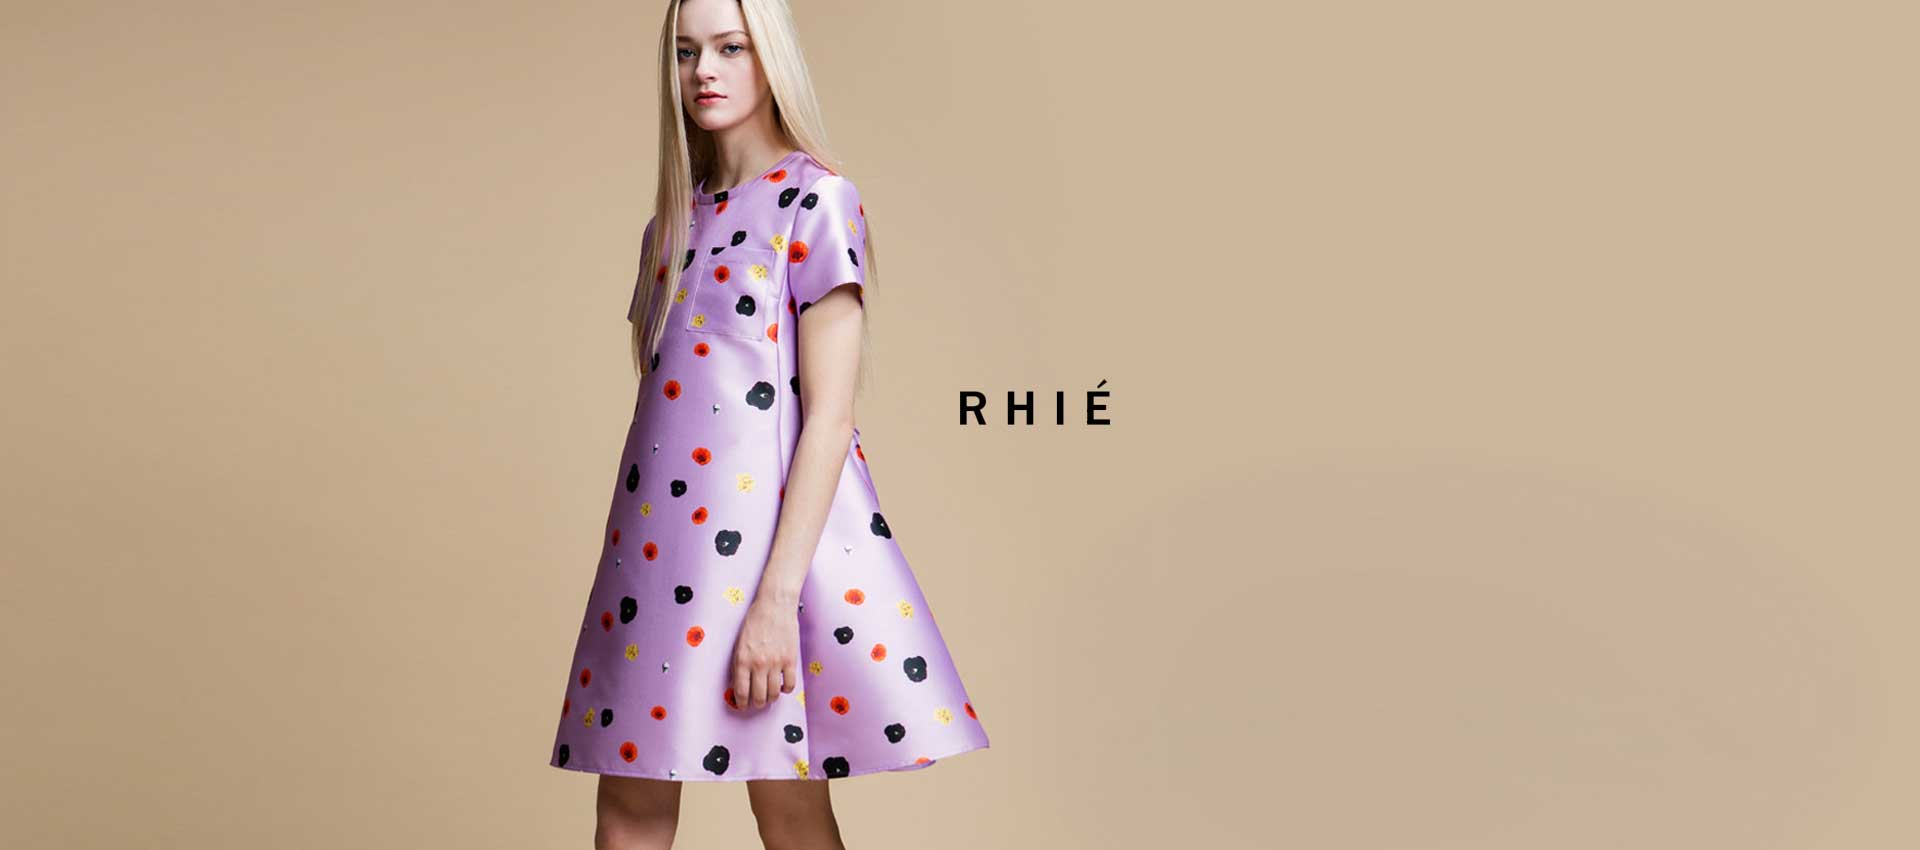 Rhie Studio